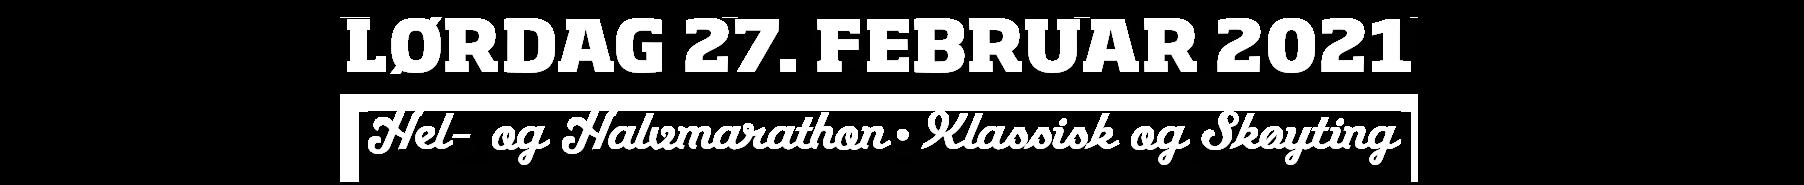 Hafjell skimaraton logo